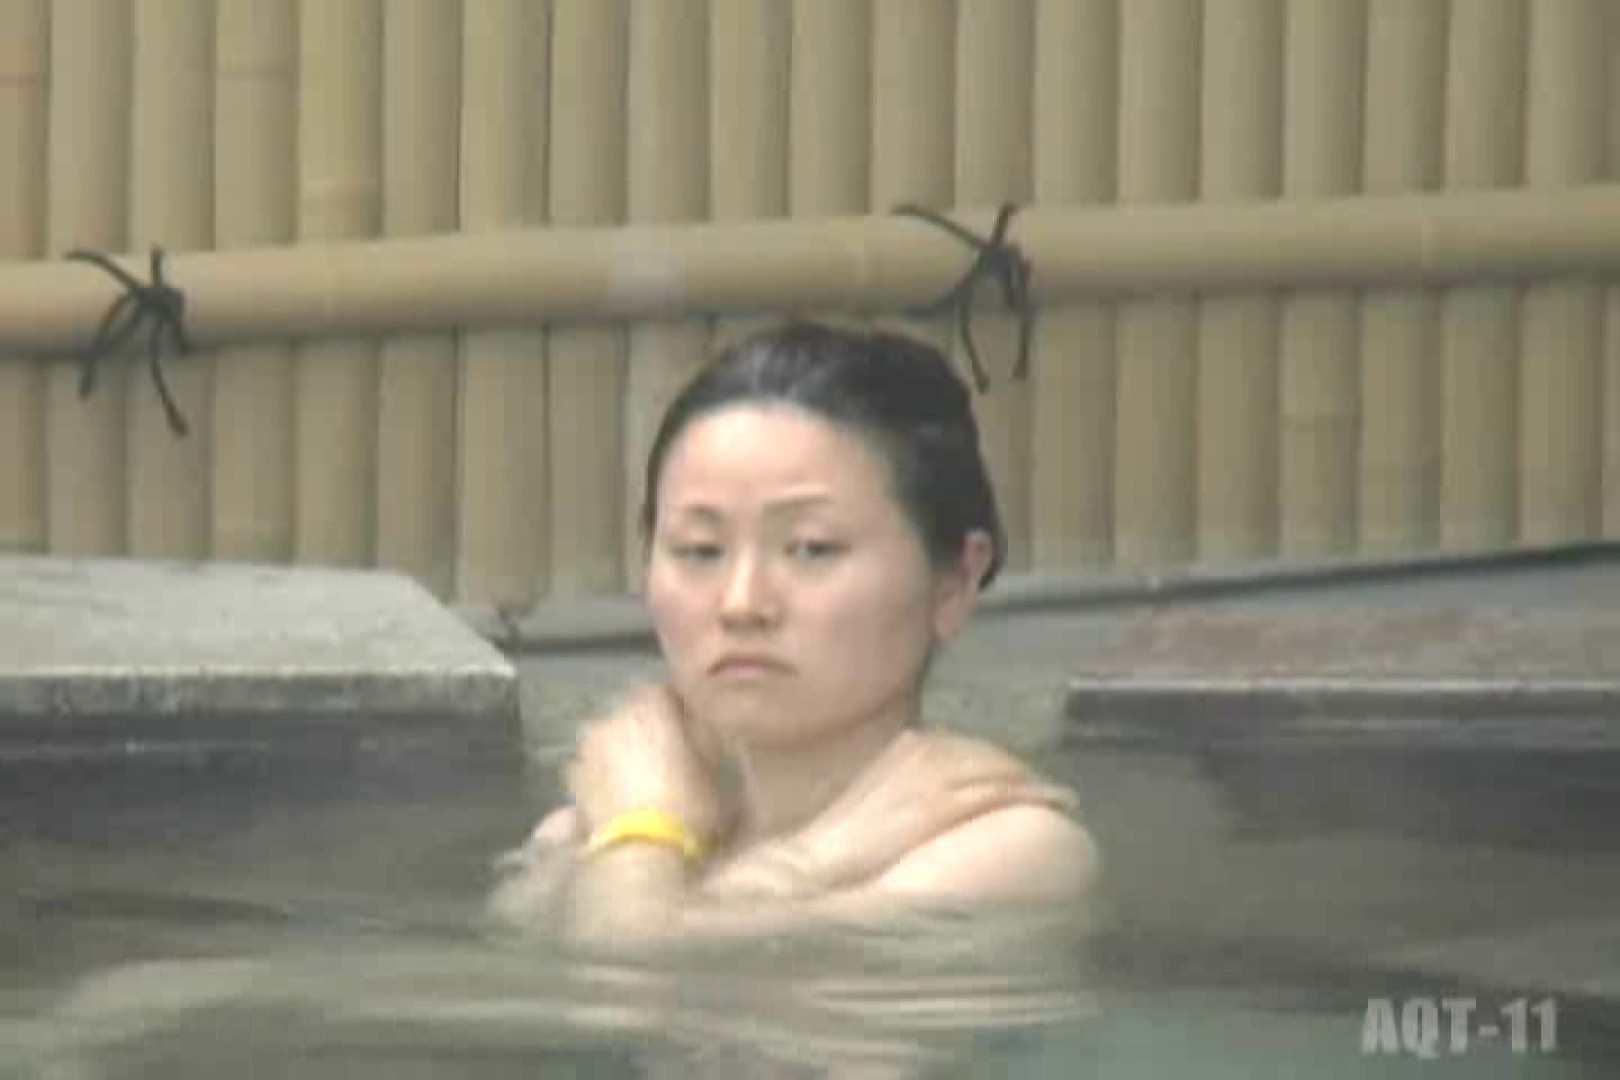 Aquaな露天風呂Vol.802 女体盗撮 盗み撮りSEX無修正画像 85連発 83